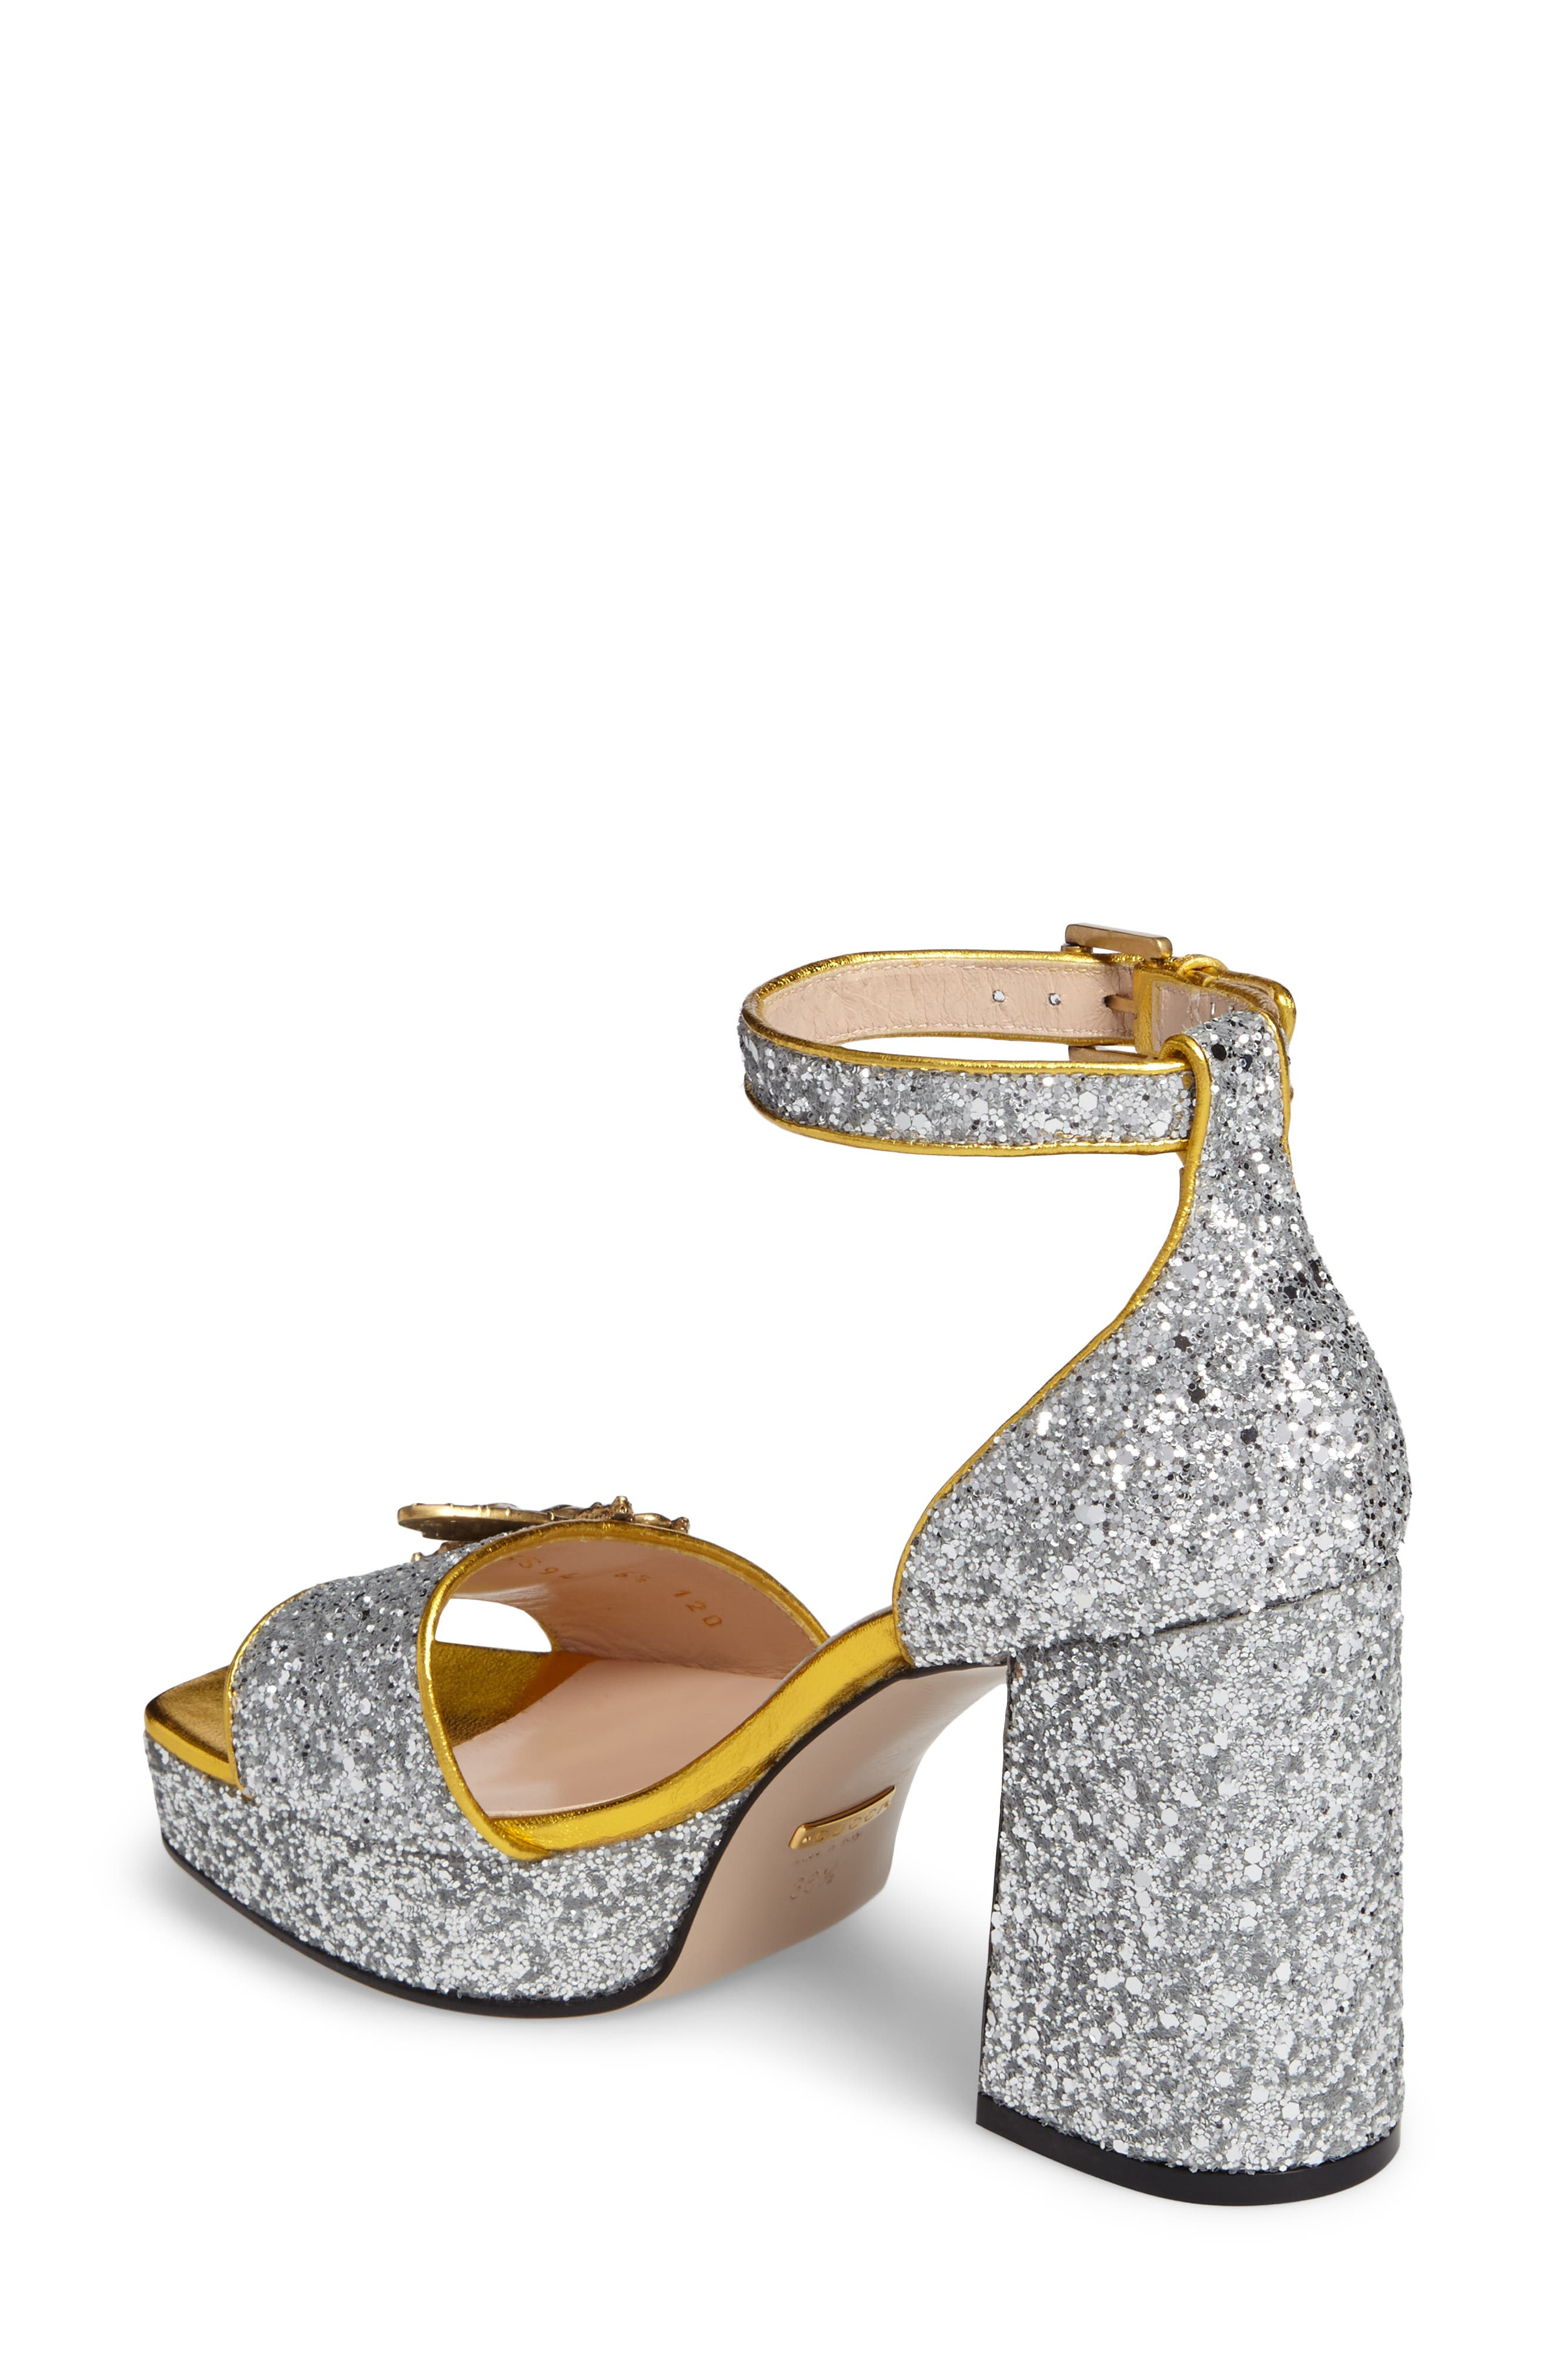 GUCCI,                             Soko Glitter Bee Sandal,                             Alternate thumbnail 2, color,                             040